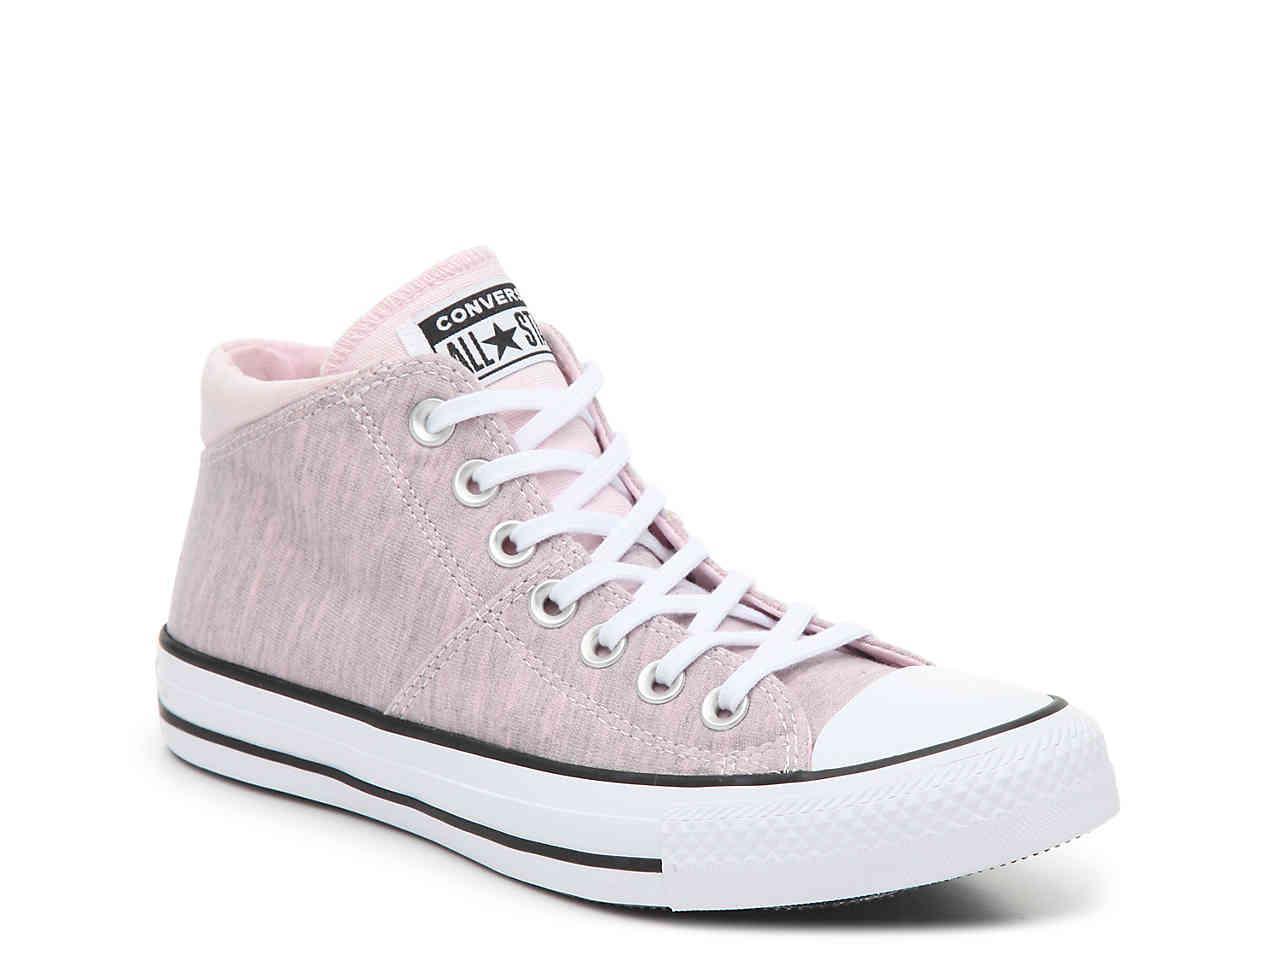 05dfcfefcca13b Converse. Women s Chuck Taylor All Star Madison Mid-top Sneaker